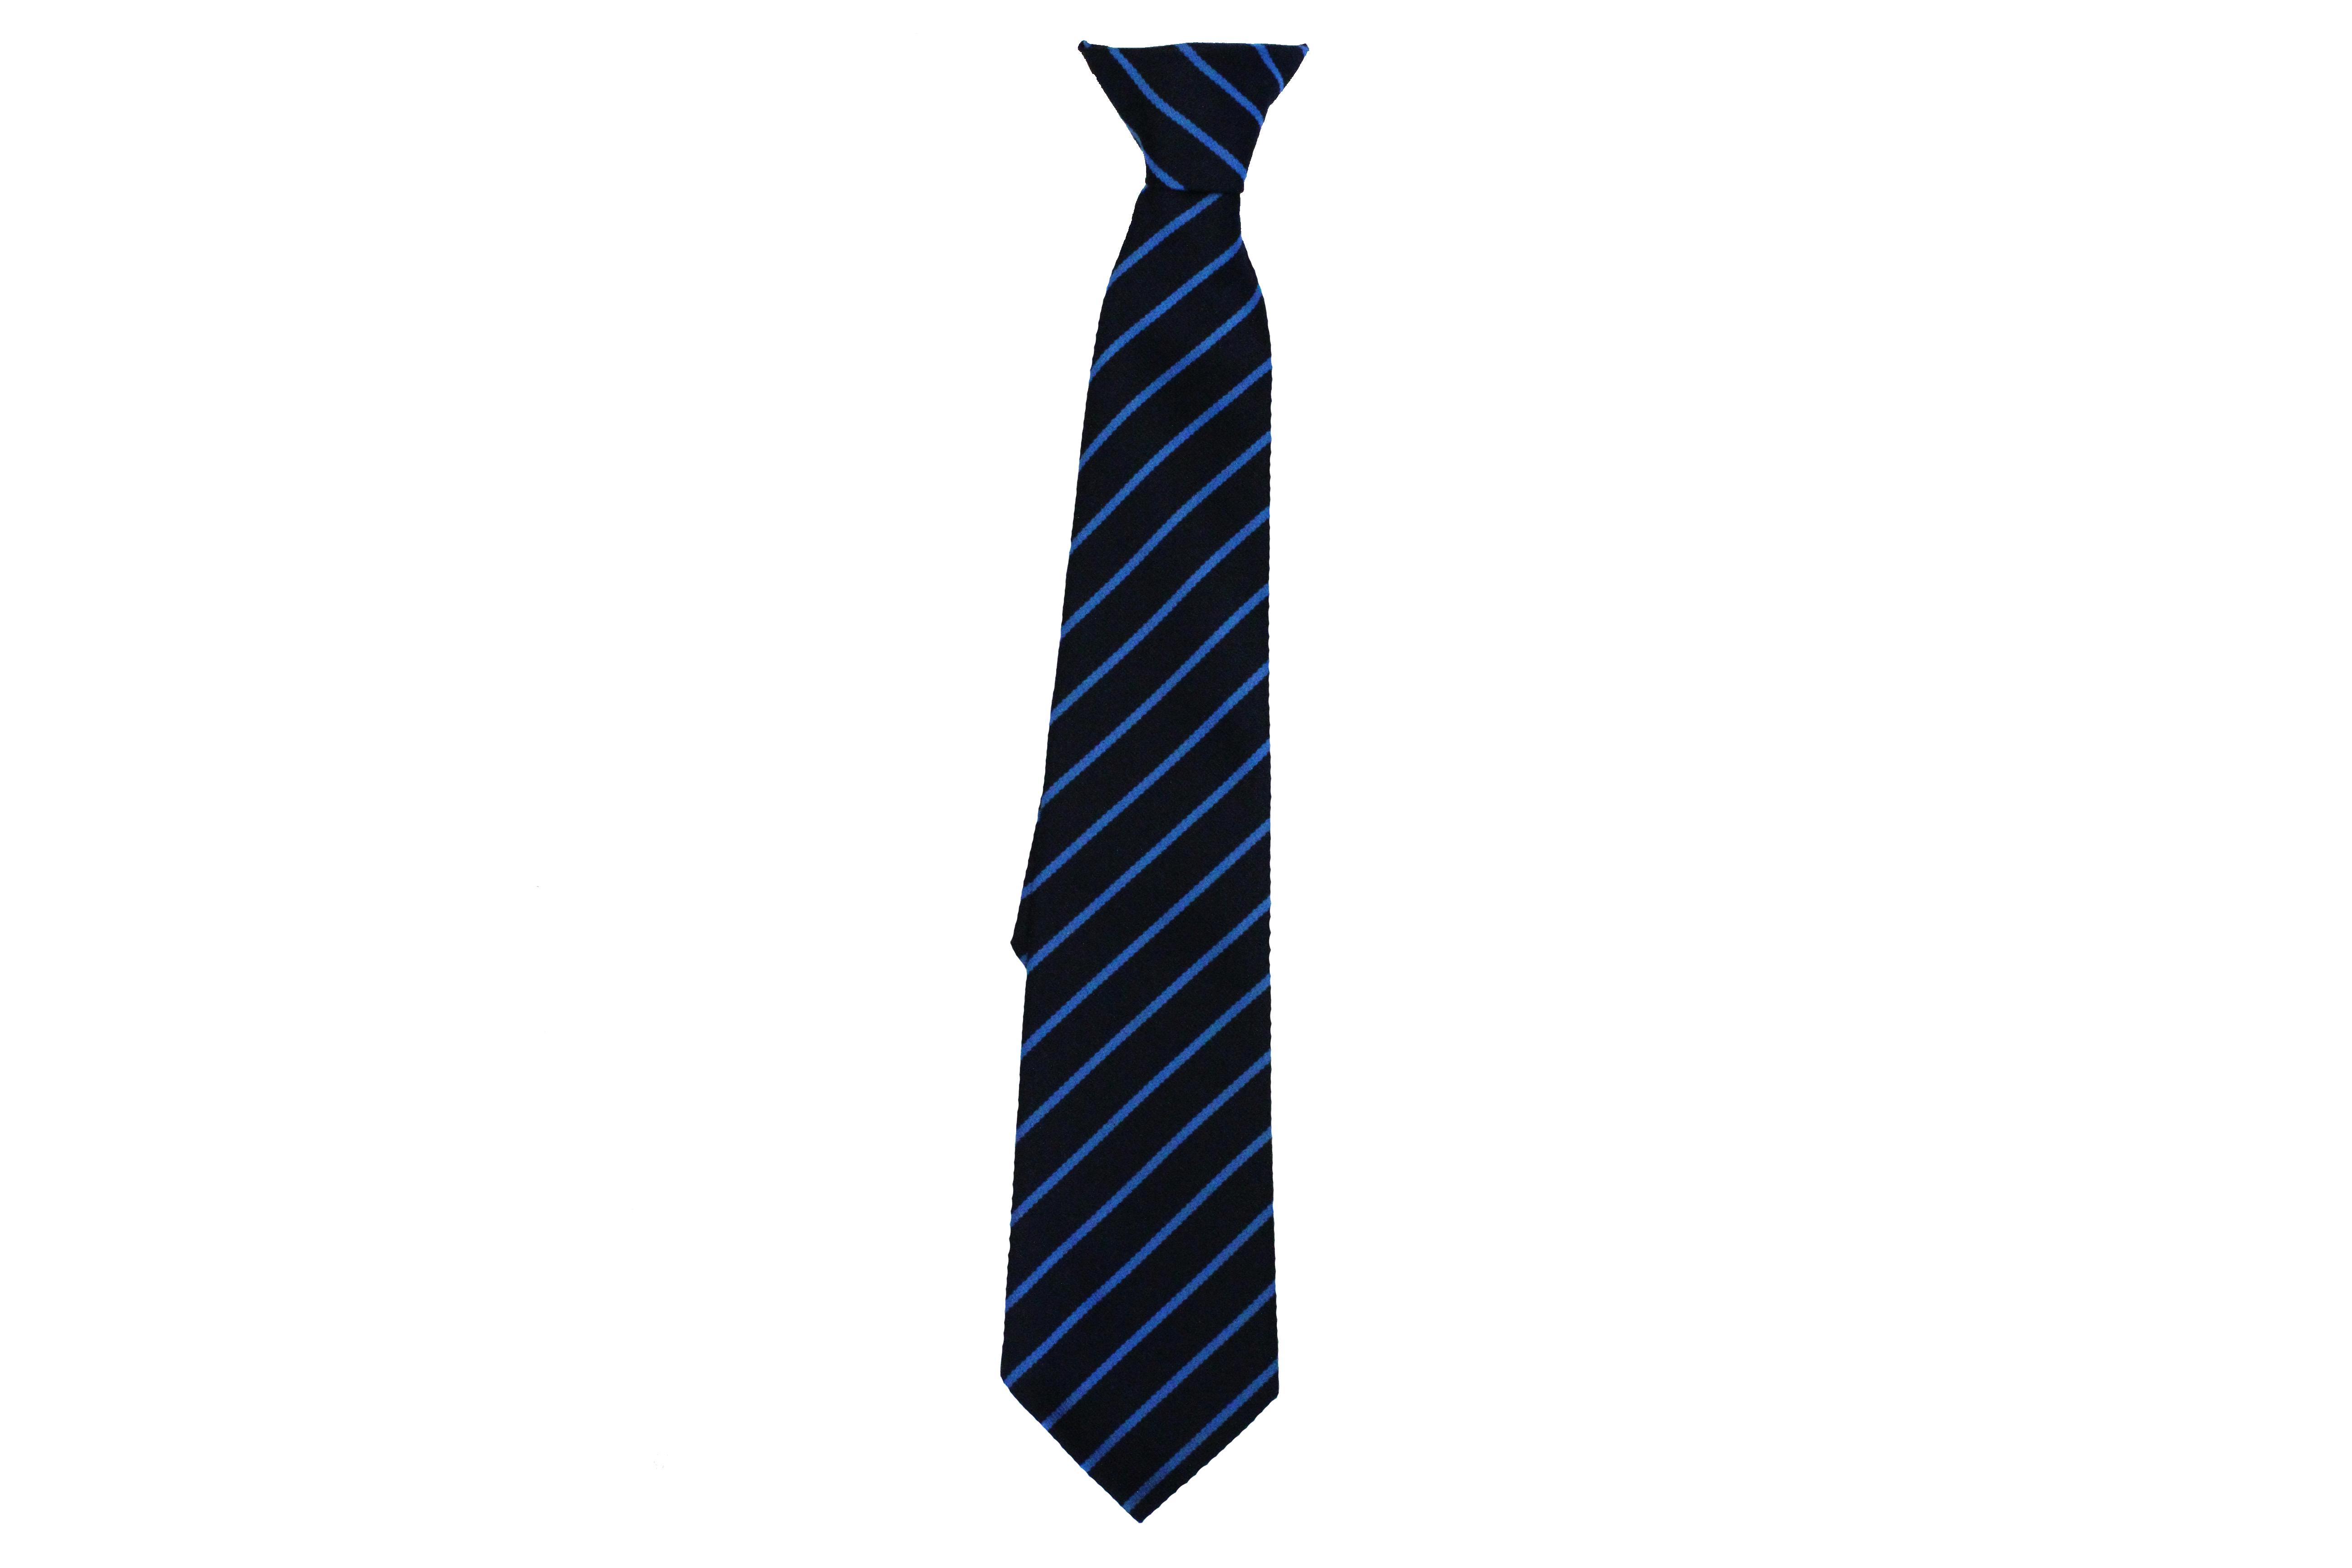 SWRA Tie - Chitral - Blue